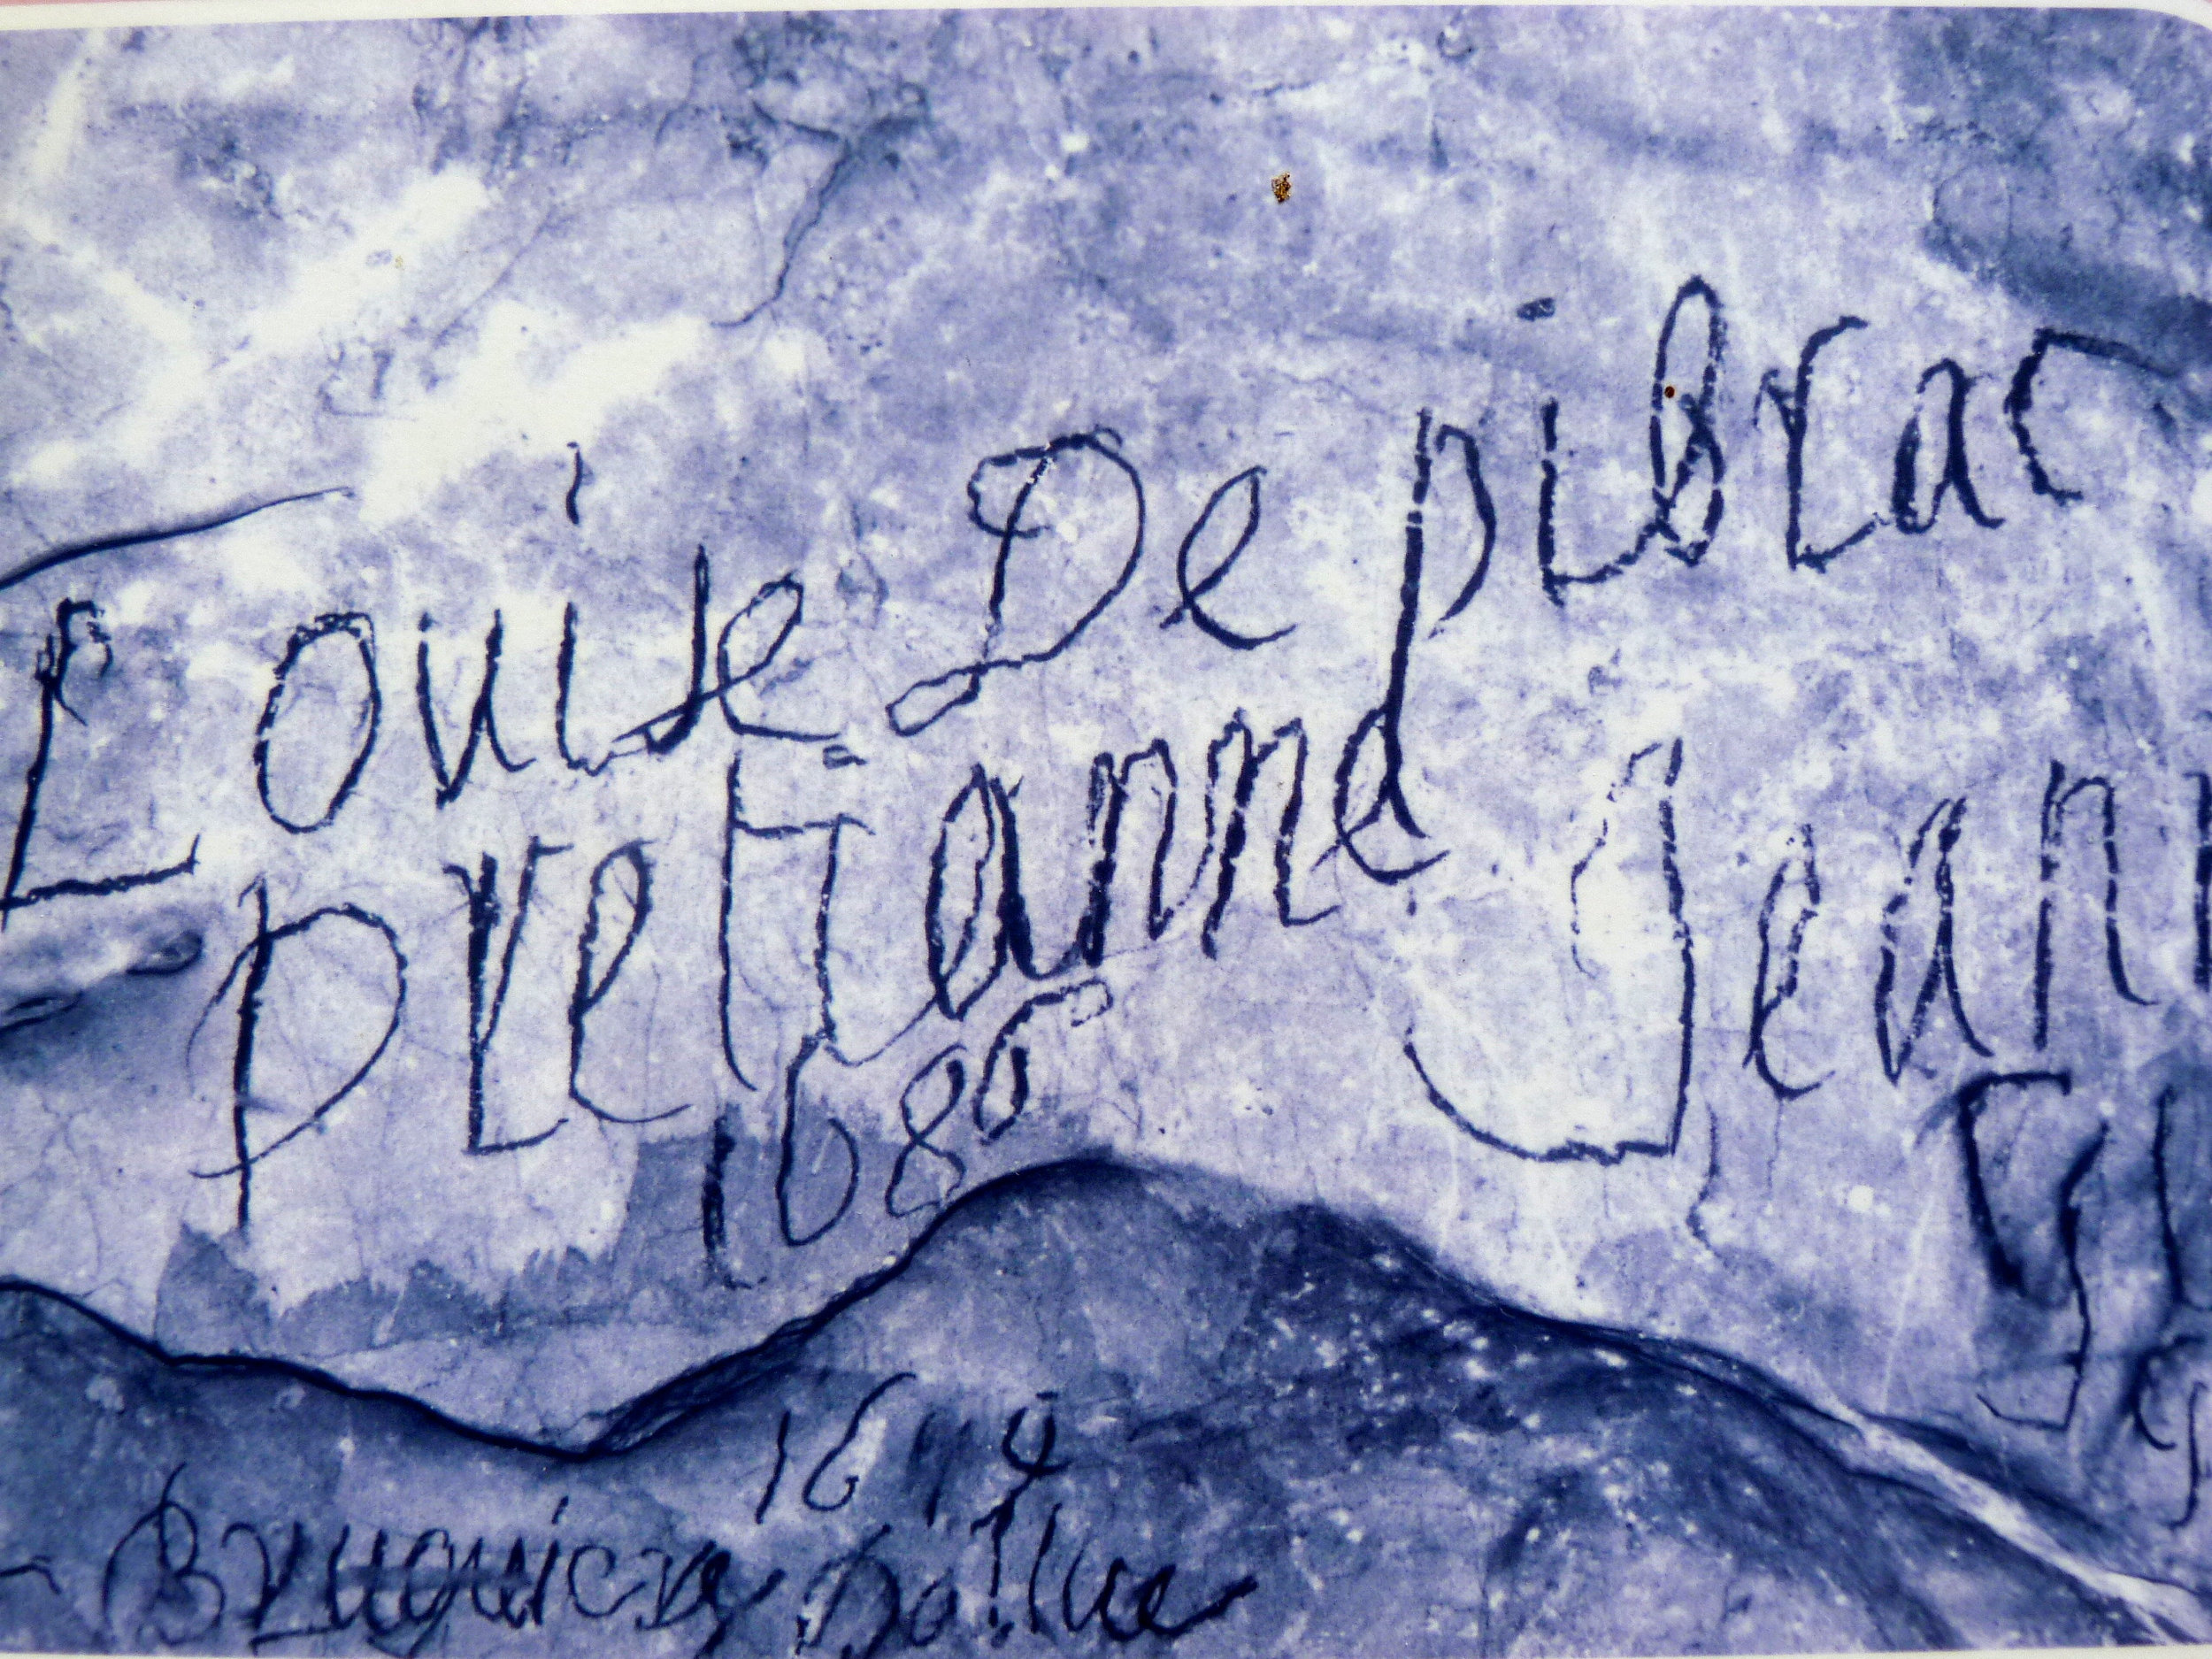 UNA GROTTA TIRA L'ALTRA, ALLA SCOPERTA DEI GRAFFITI - Firma di Louise de Pibrac Pretianne, del 1686